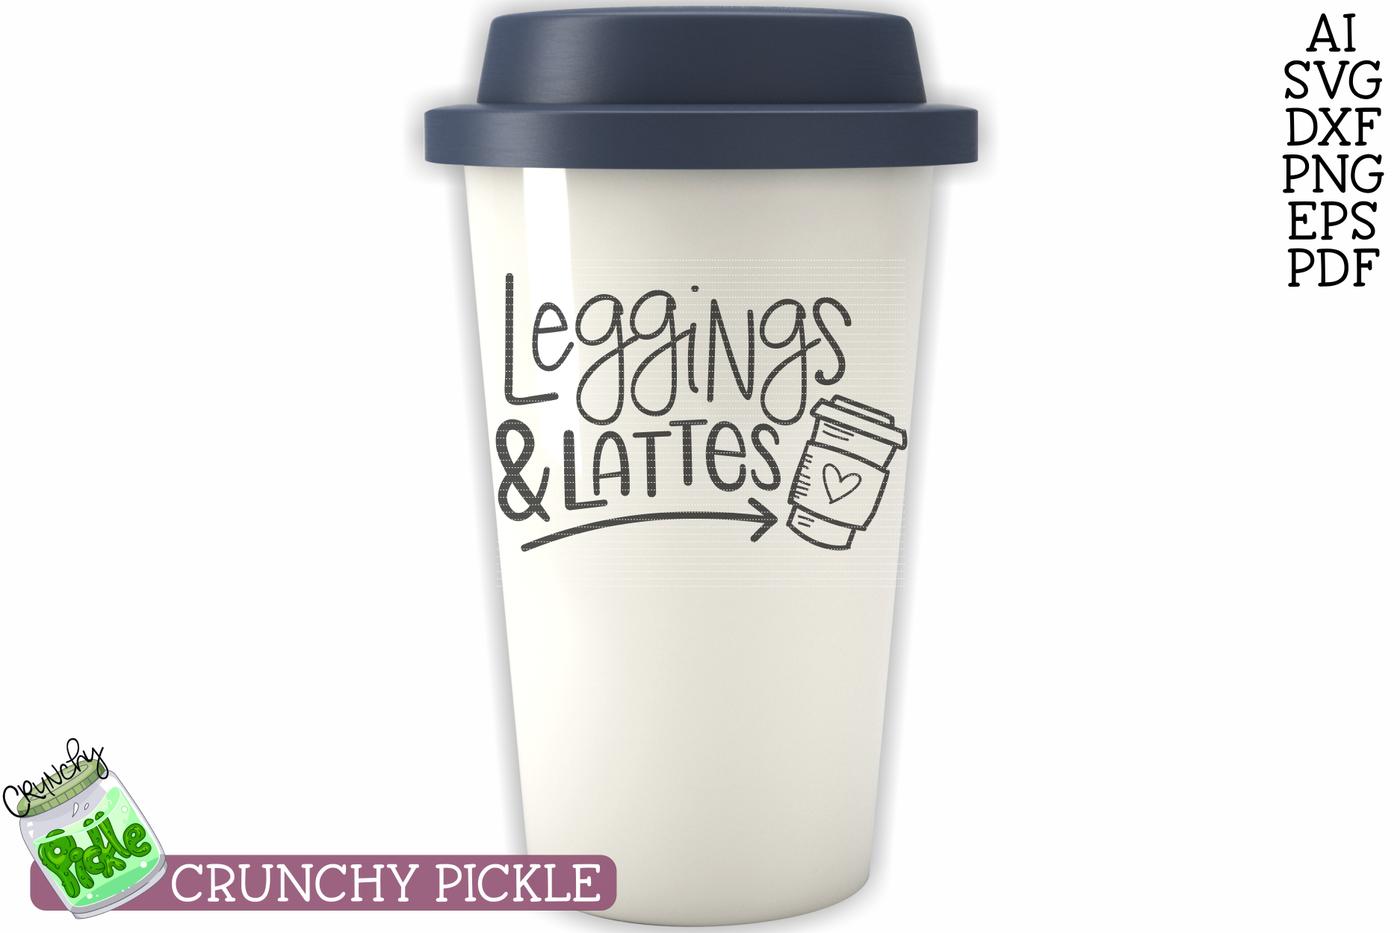 Leggings Lattes Svg By Crunchy Pickle Thehungryjpeg Com